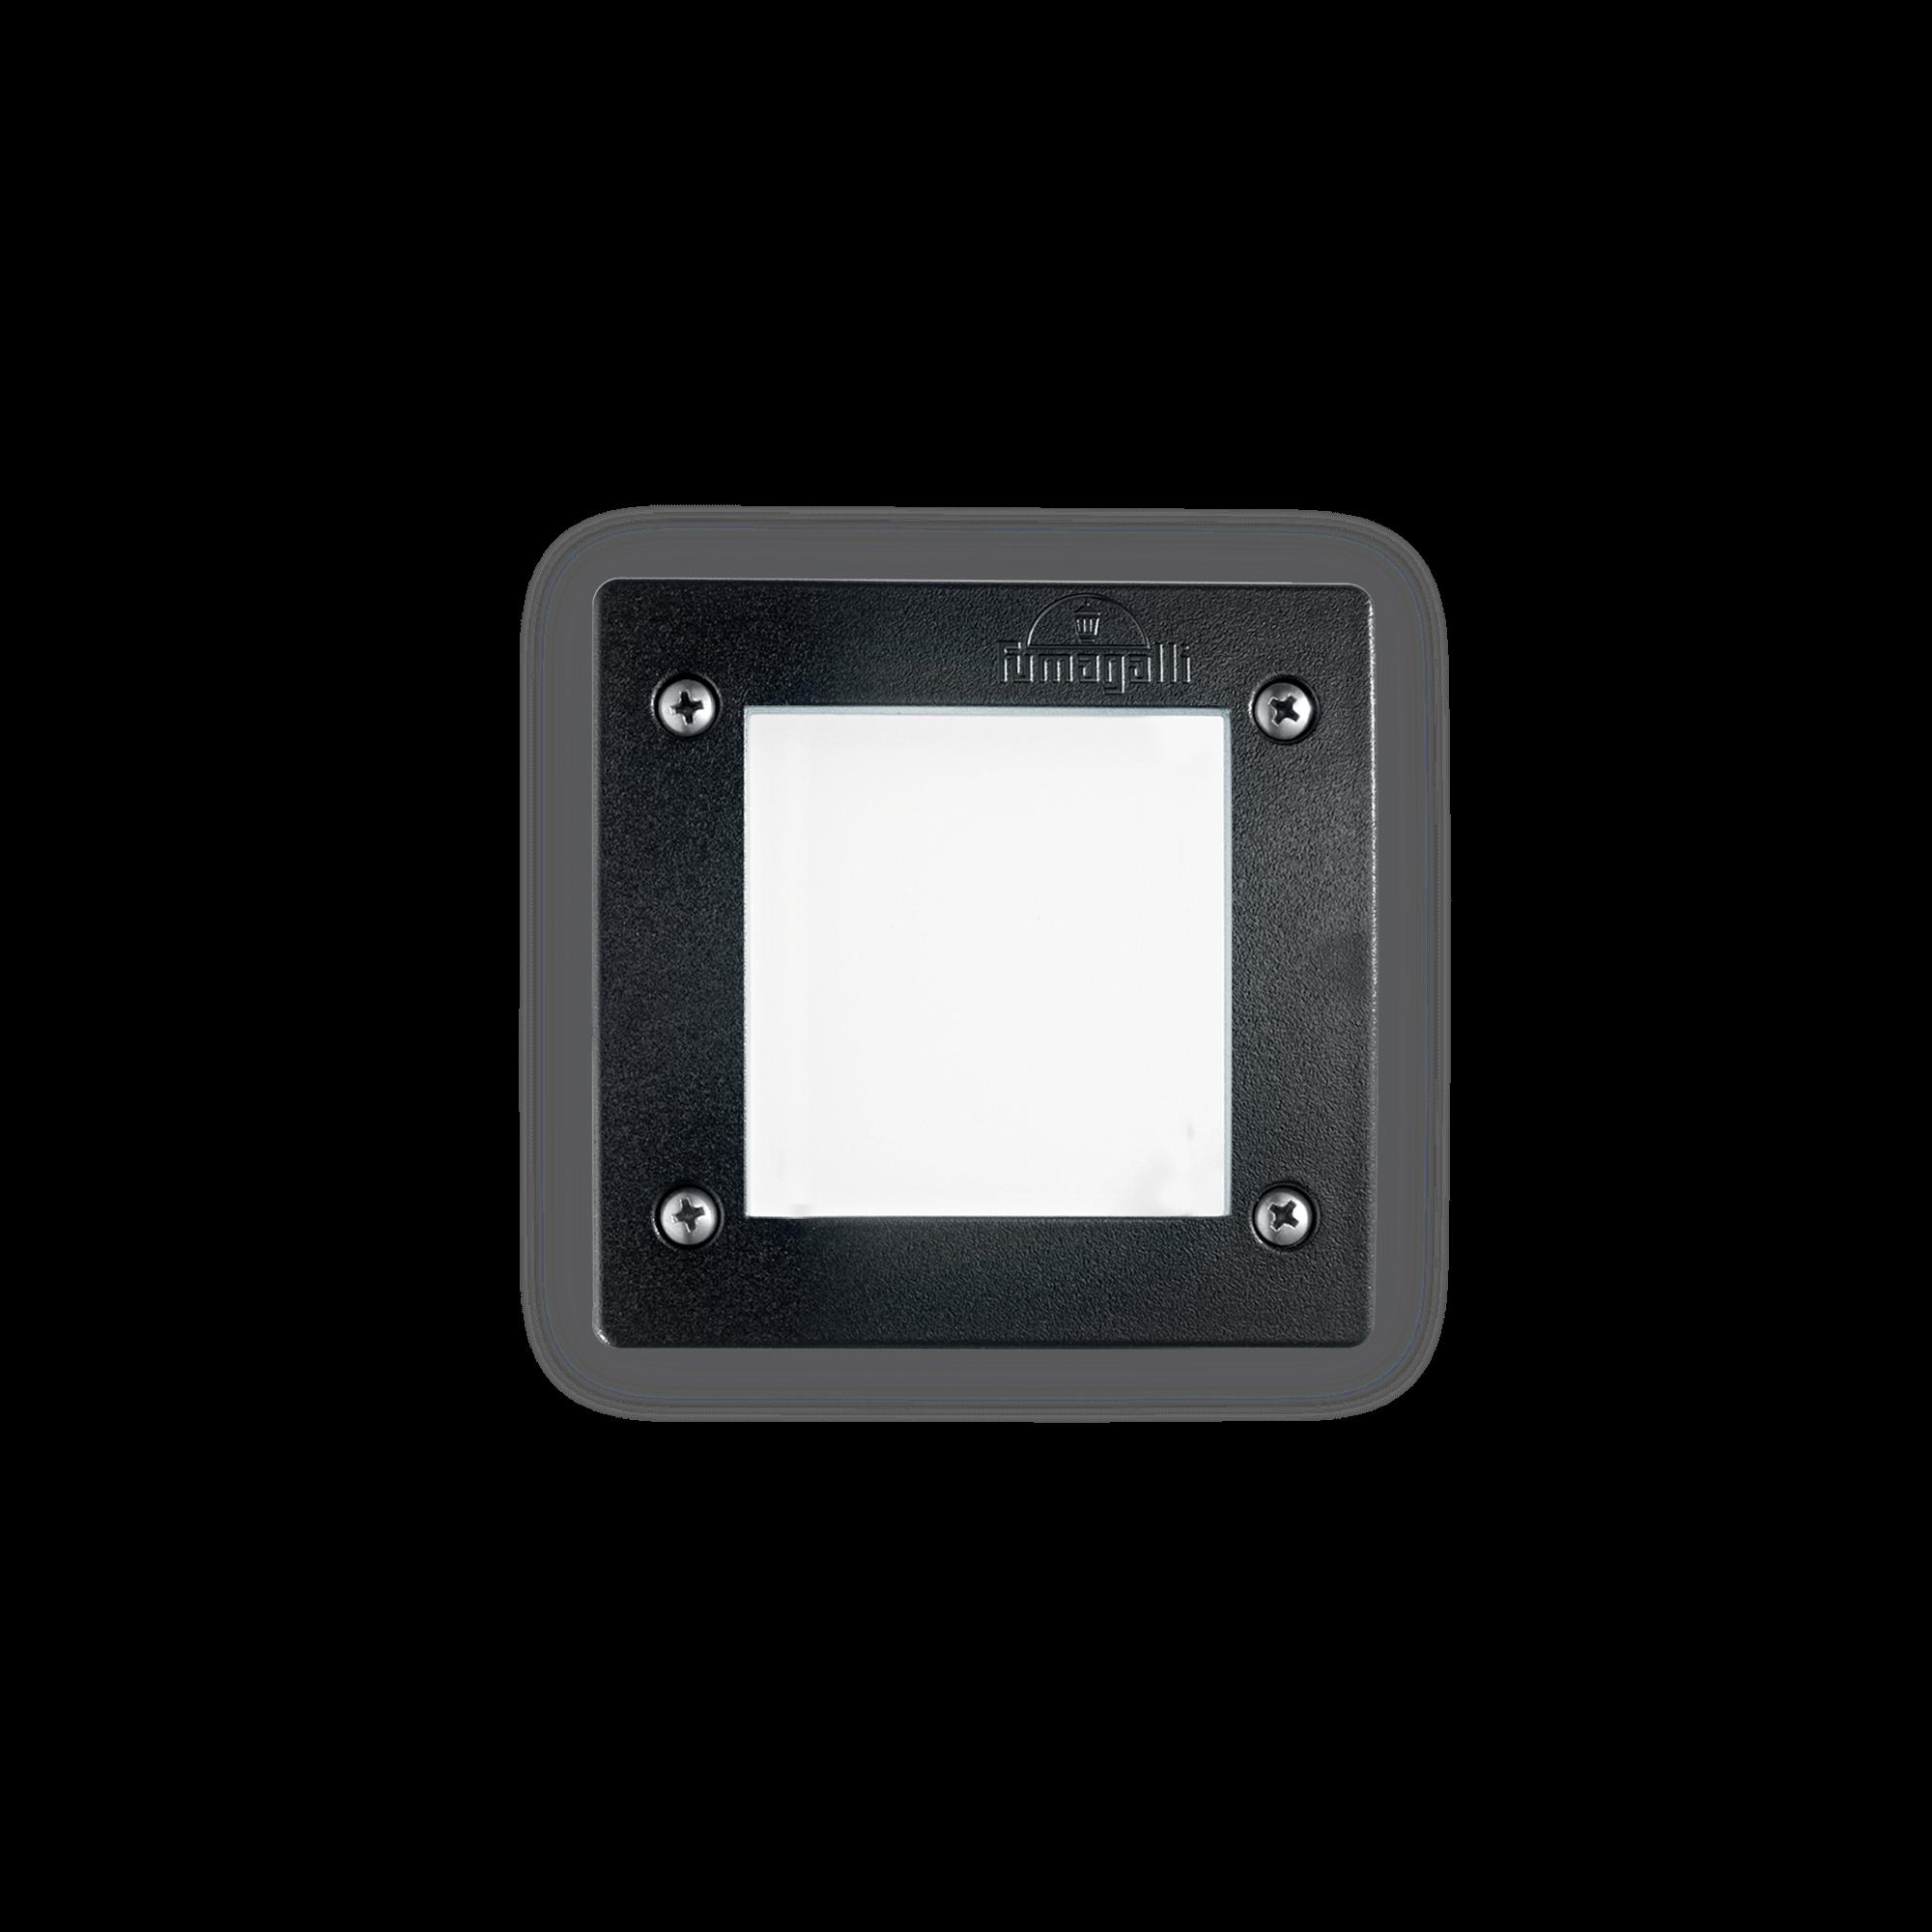 Exteriérové zápustné svítidlo Ideal lux 096582 LETI PT1 SQUARE NERO 1xGX53 23W 4000K IP66